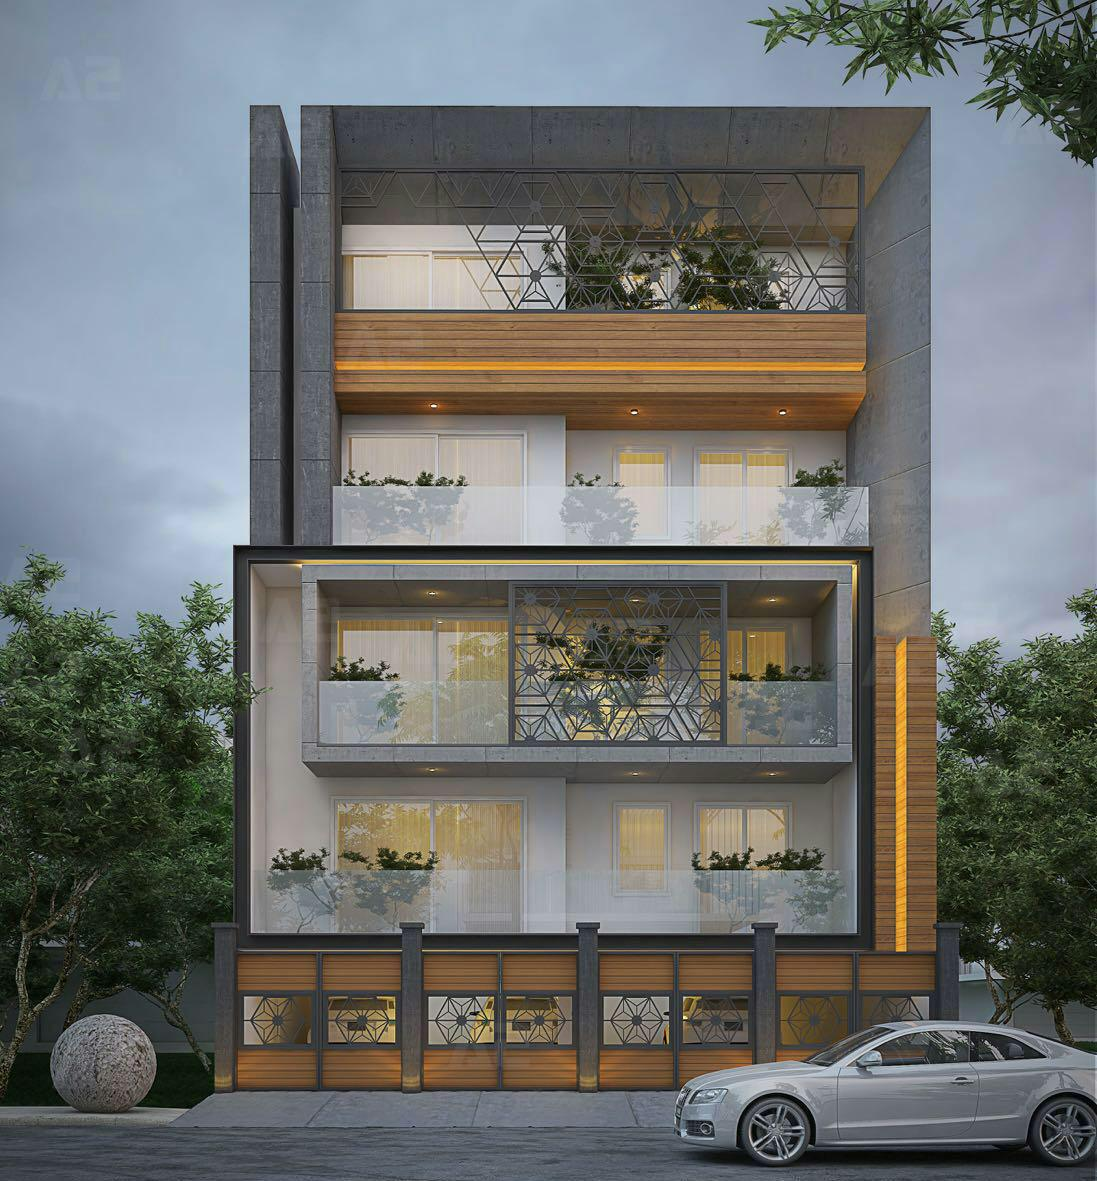 4 BHK Builder Floor in South City 2 Gurgaon